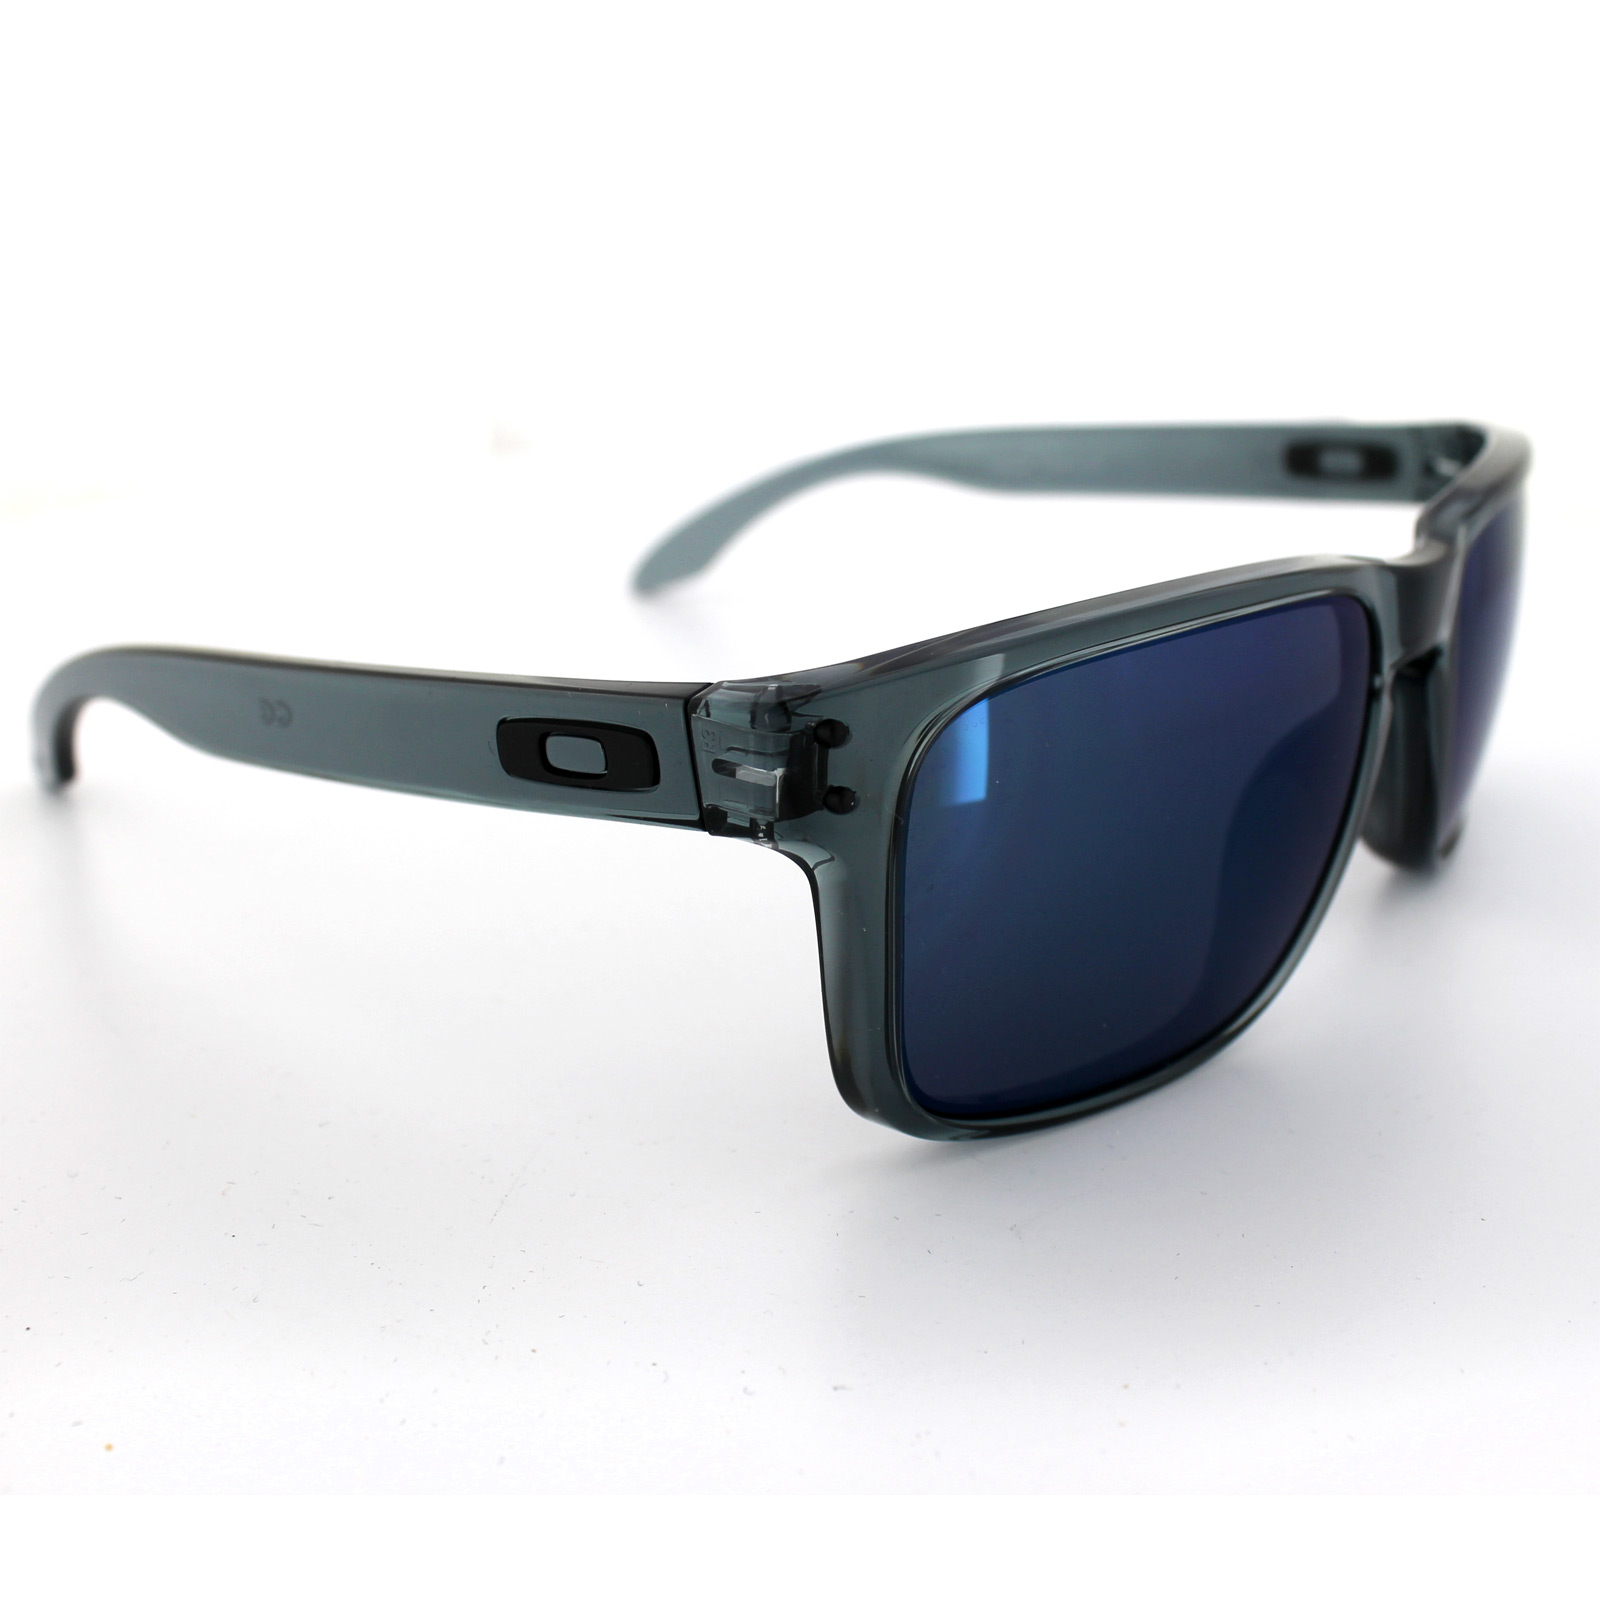 3e8a37ba857 Oakley Holbrook Crystal Black Ice Iridium « Heritage Malta. Oakley  Sunglasses ...